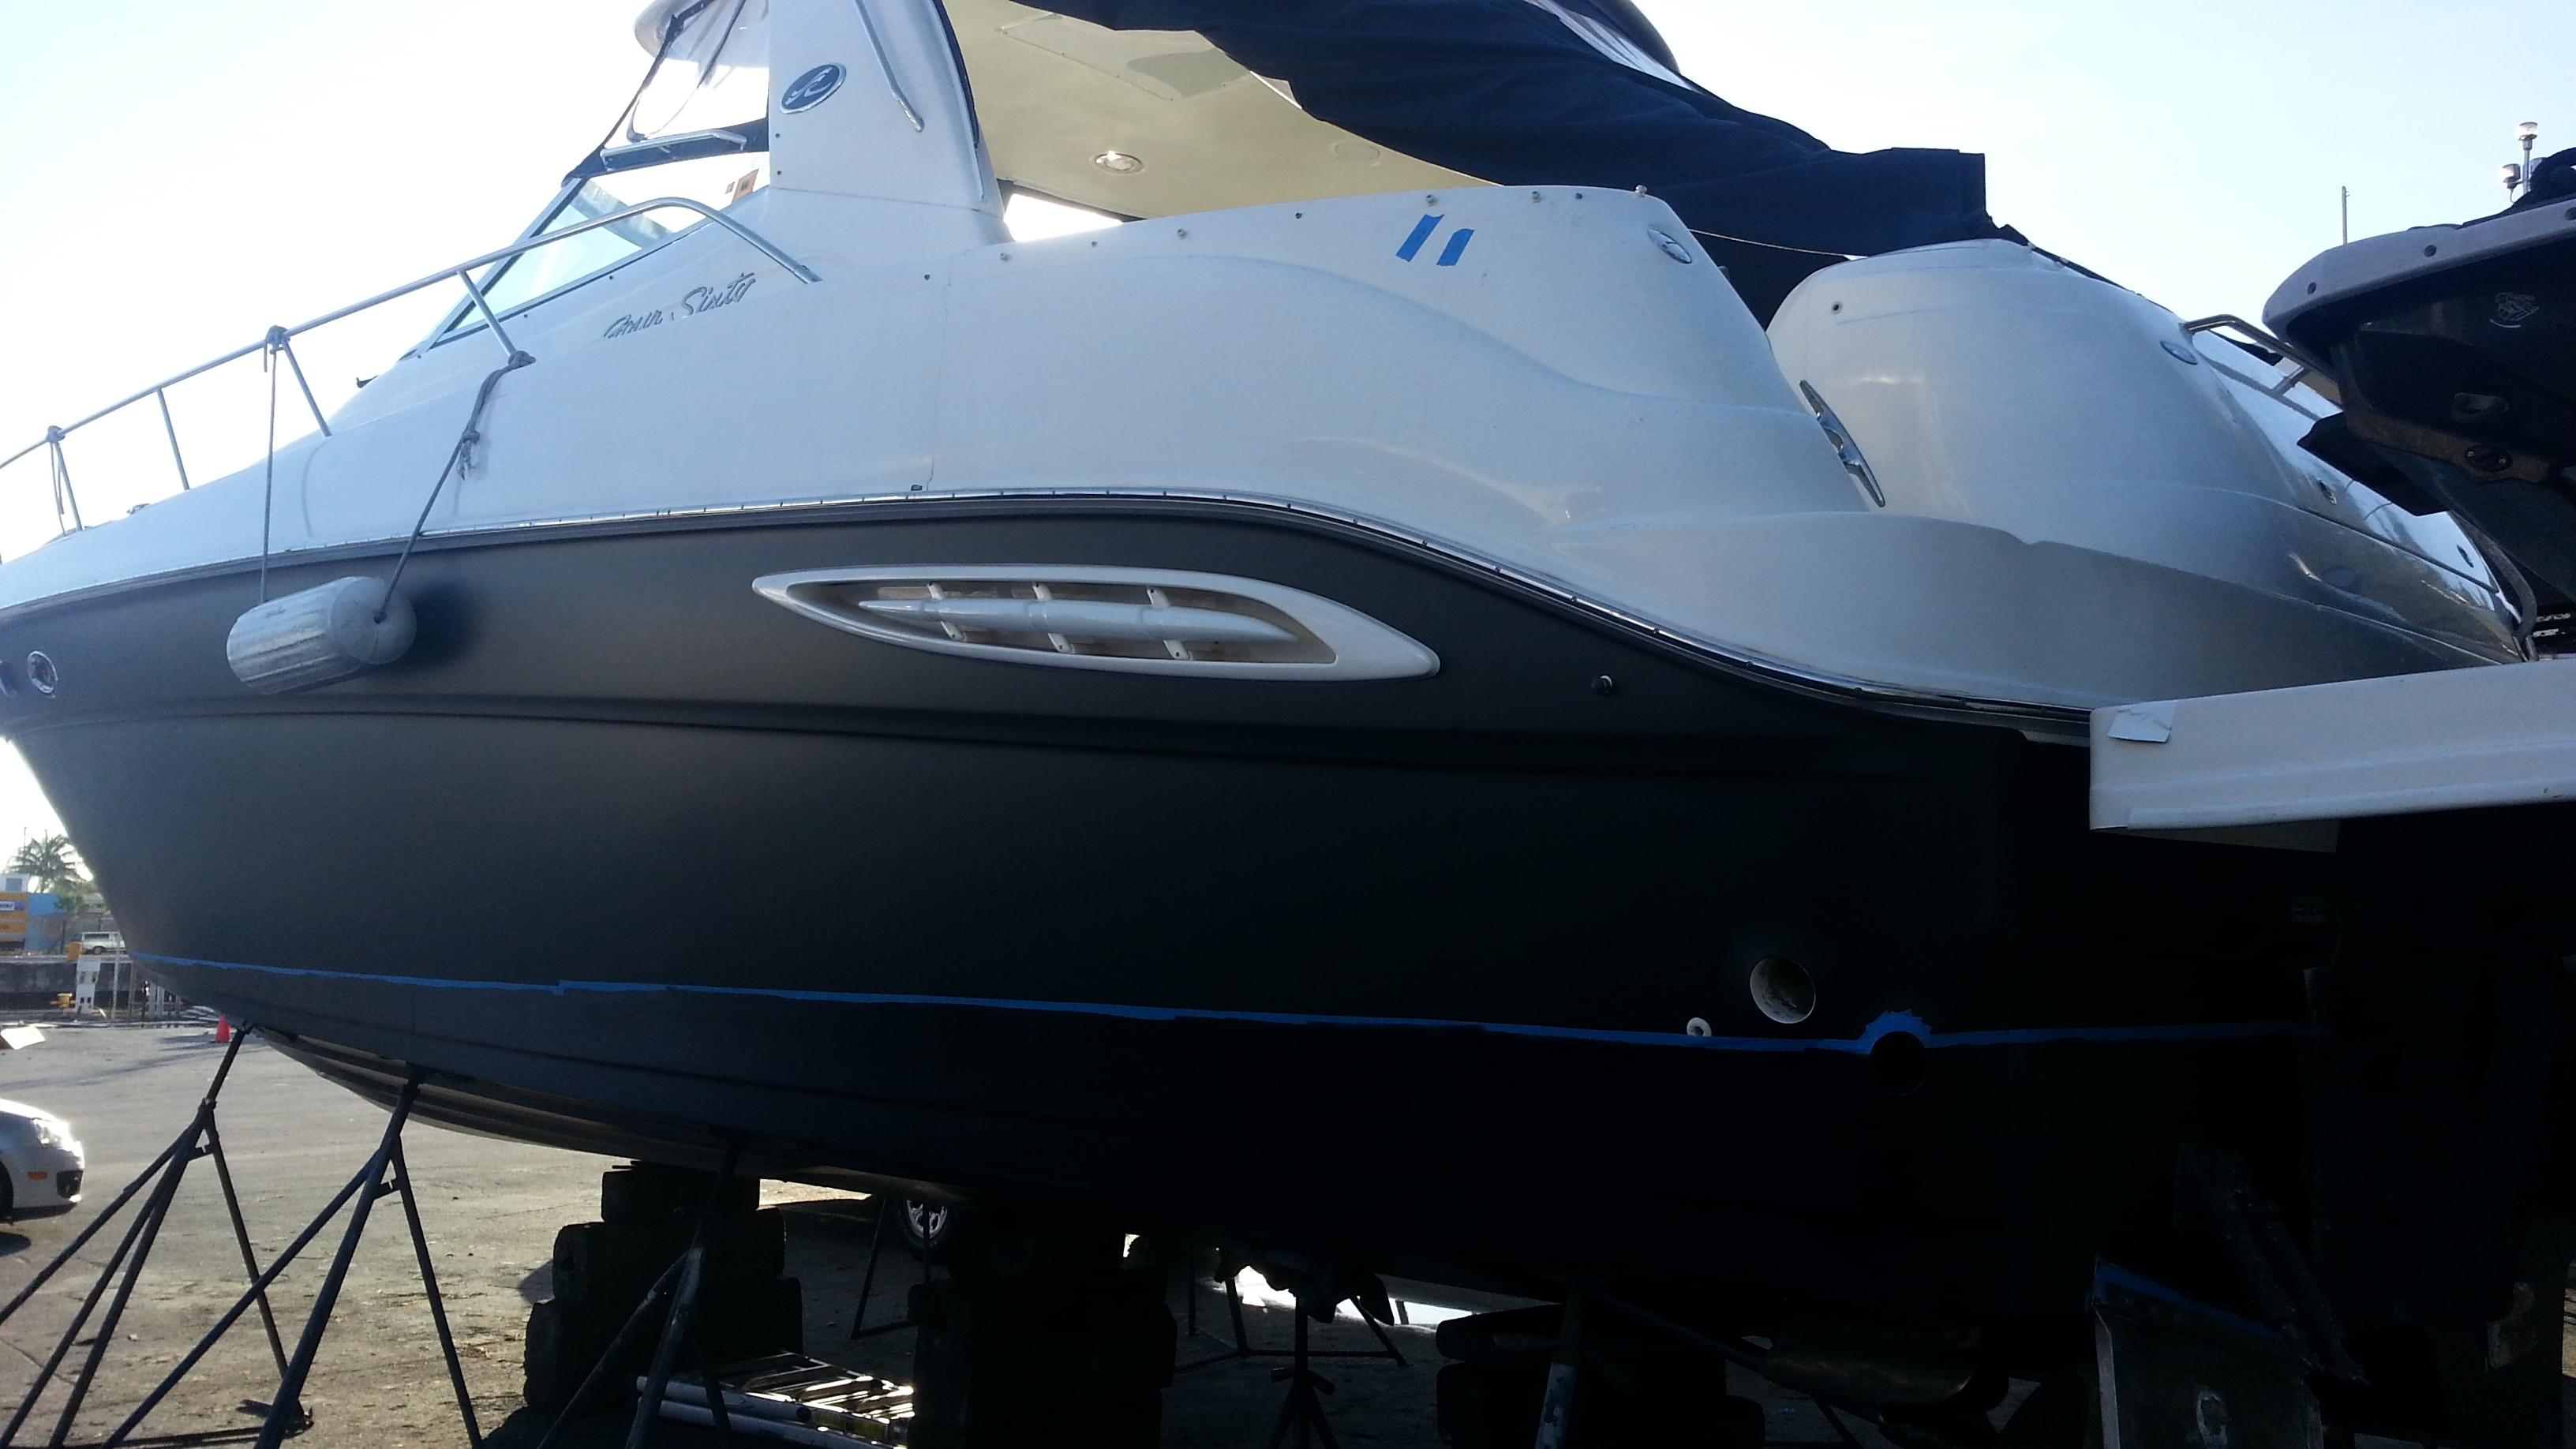 matte-black-boat-wraps-miami